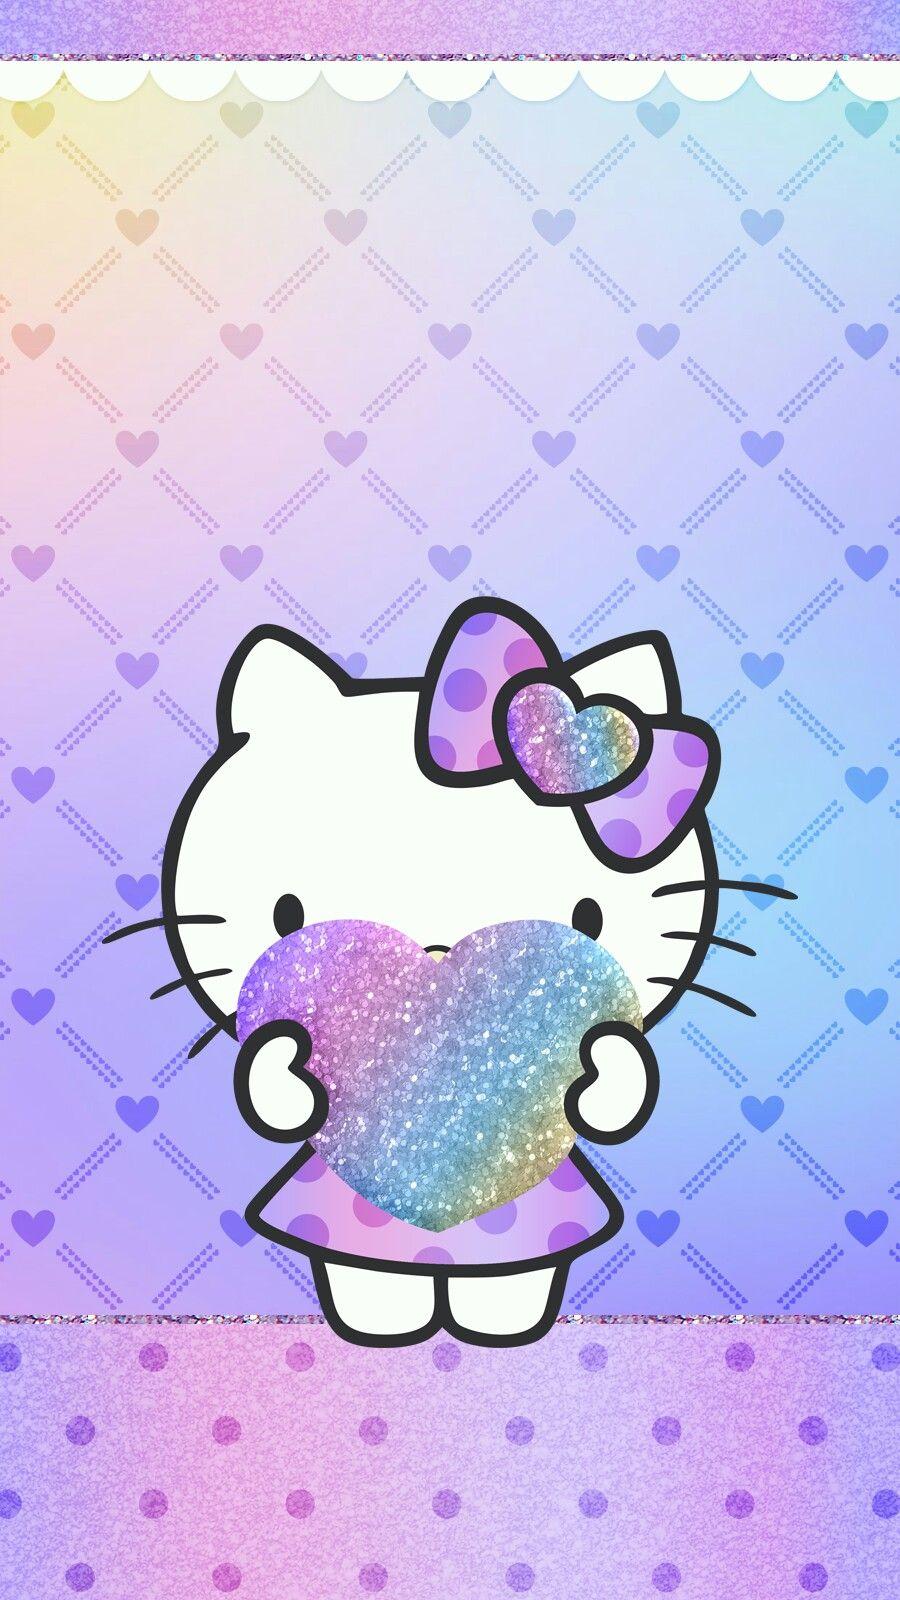 Digitalcutewalls Melody Hello Kitty Hello Kitty Wallpaper Hello Kitty Backgrounds